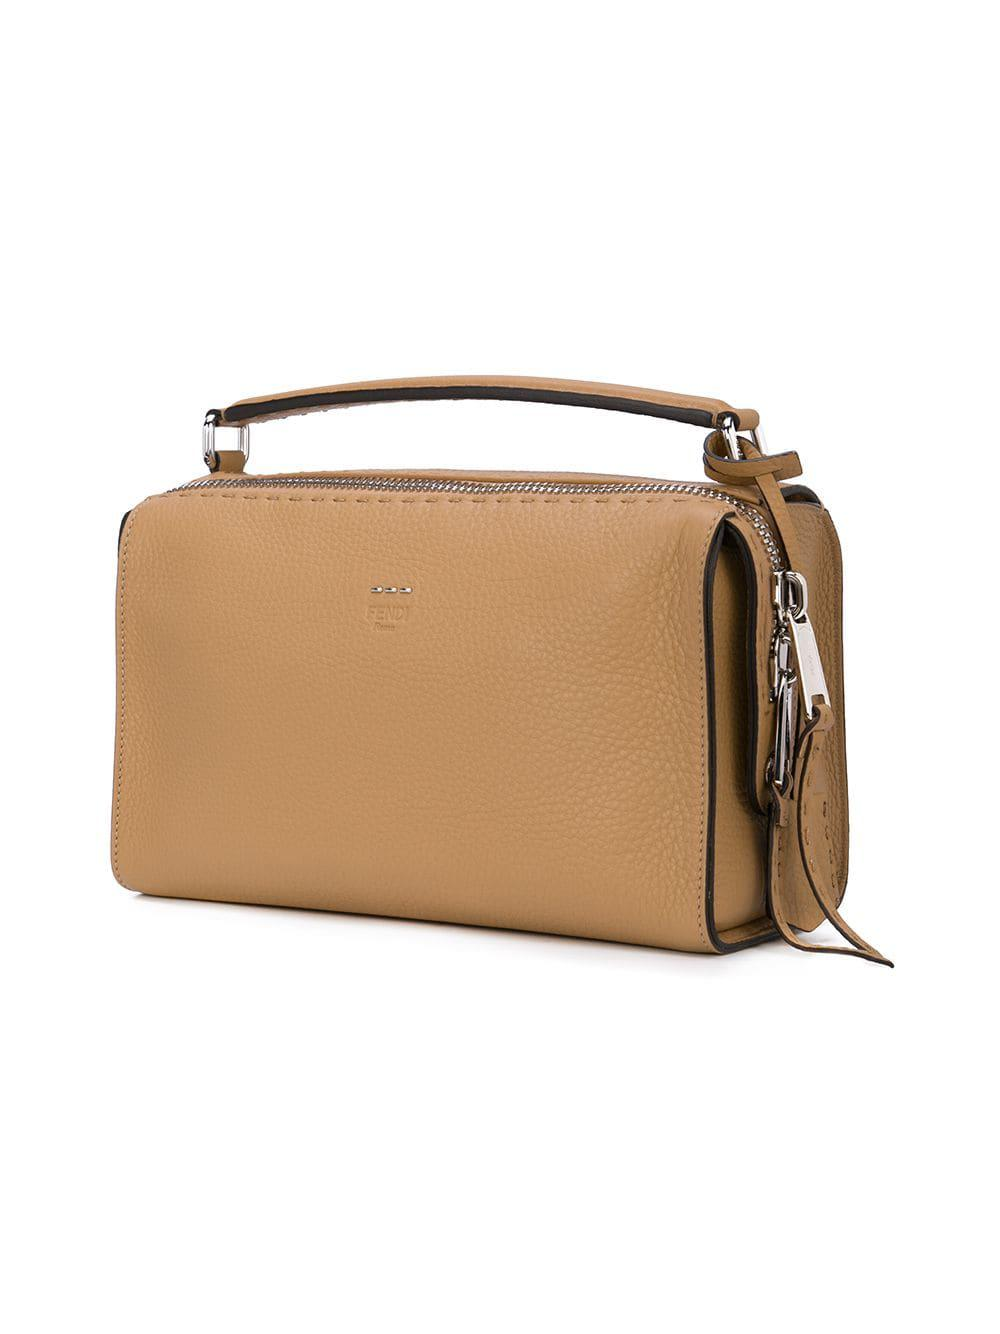 16786b50bb Fendi - Brown Lei Selleria Bag - Lyst. View fullscreen